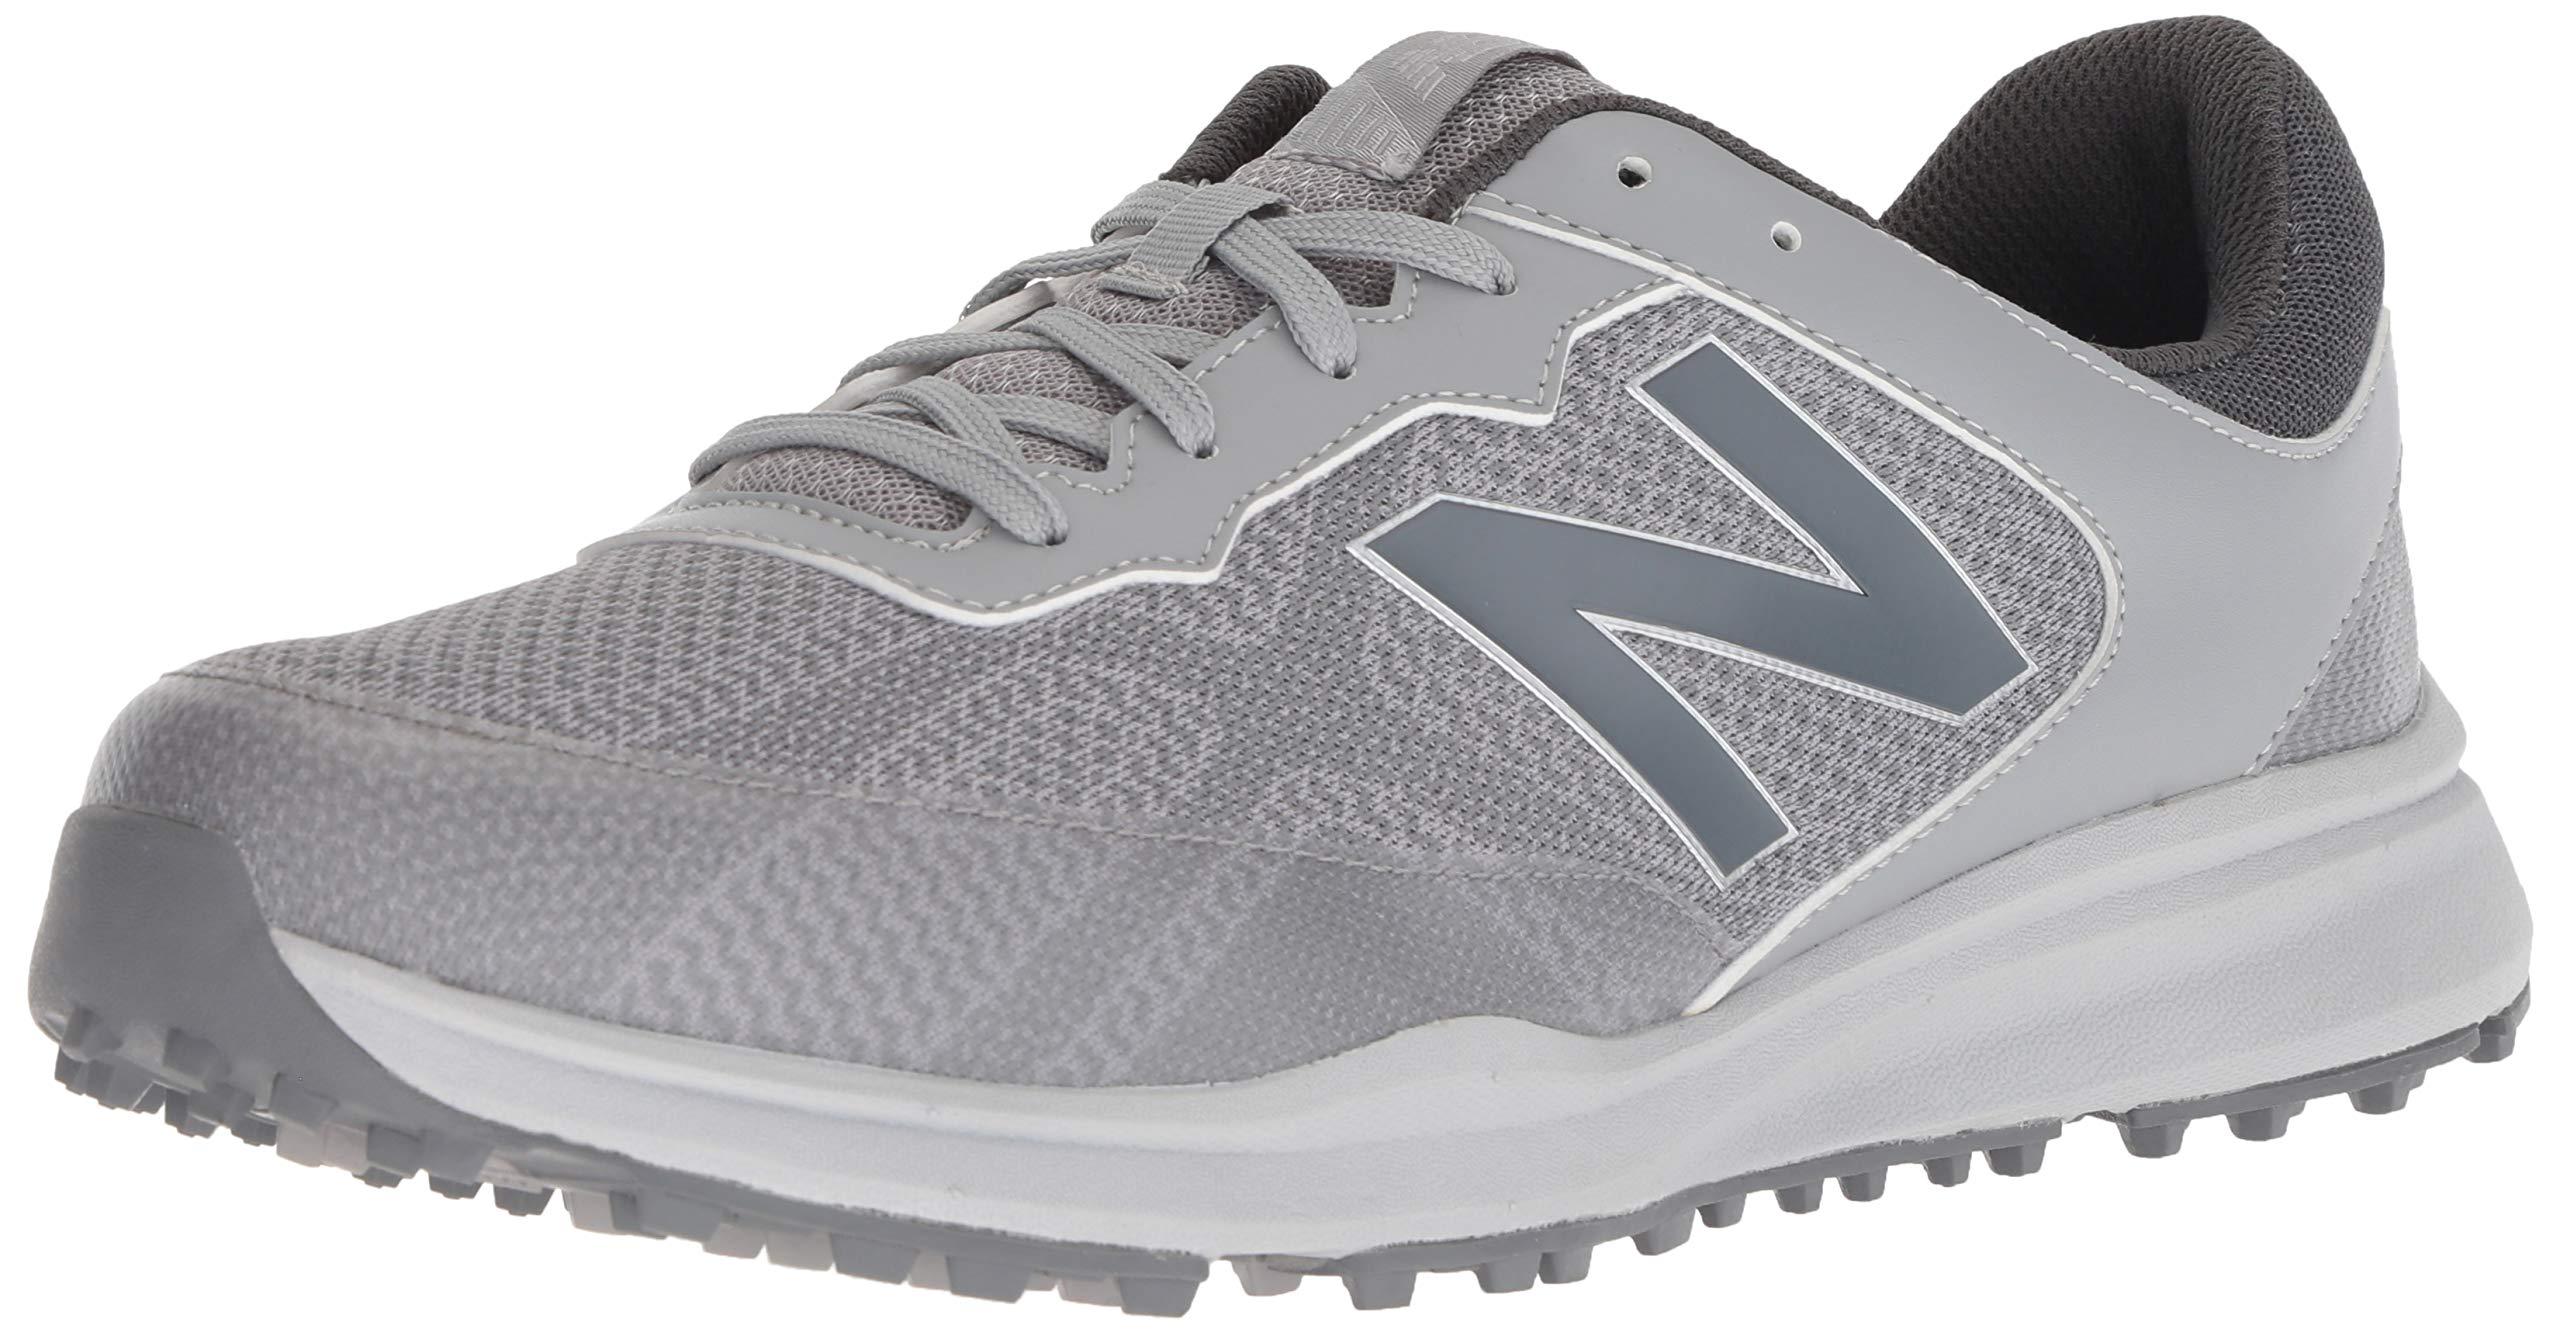 New Balance Men's Breeze Breathable Spikeless Comfort Golf Shoe, Grey, 9.5 4E 4E US by New Balance